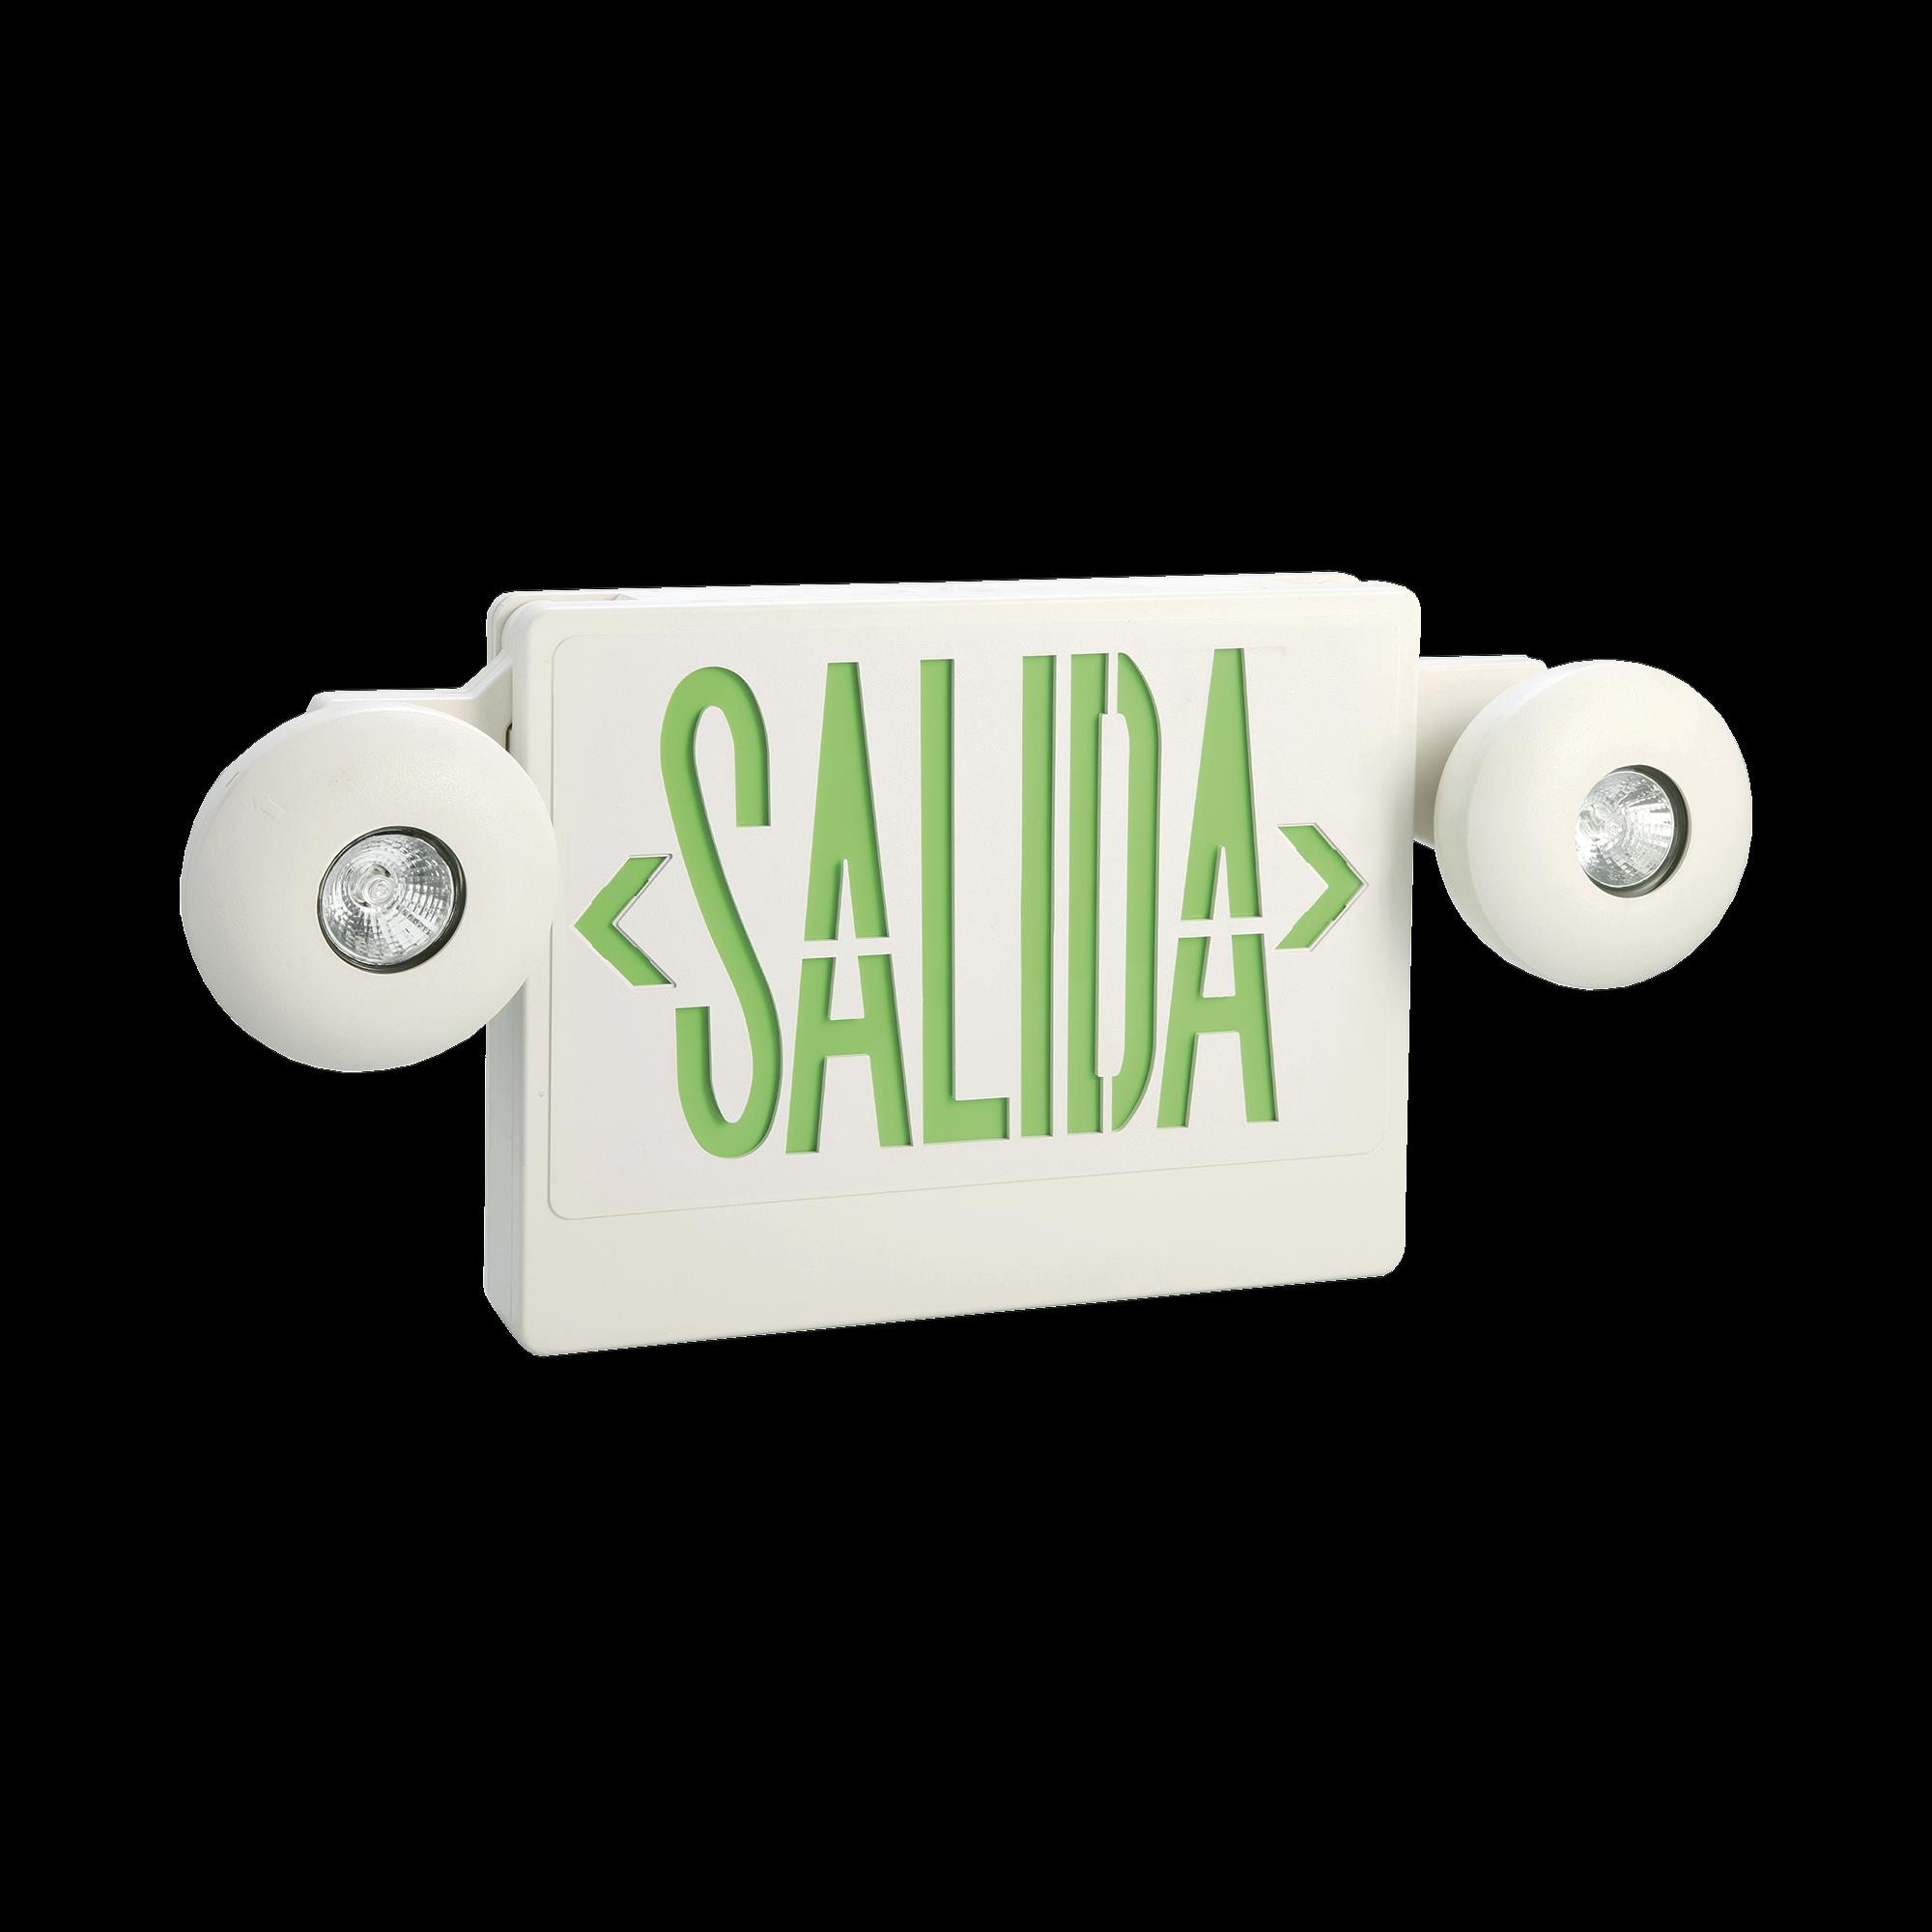 Letrero LED de SALIDA con Luz de Emergencia/Montaje Universal (pared, lateral o Techo)/Batería de Respaldo Incluida